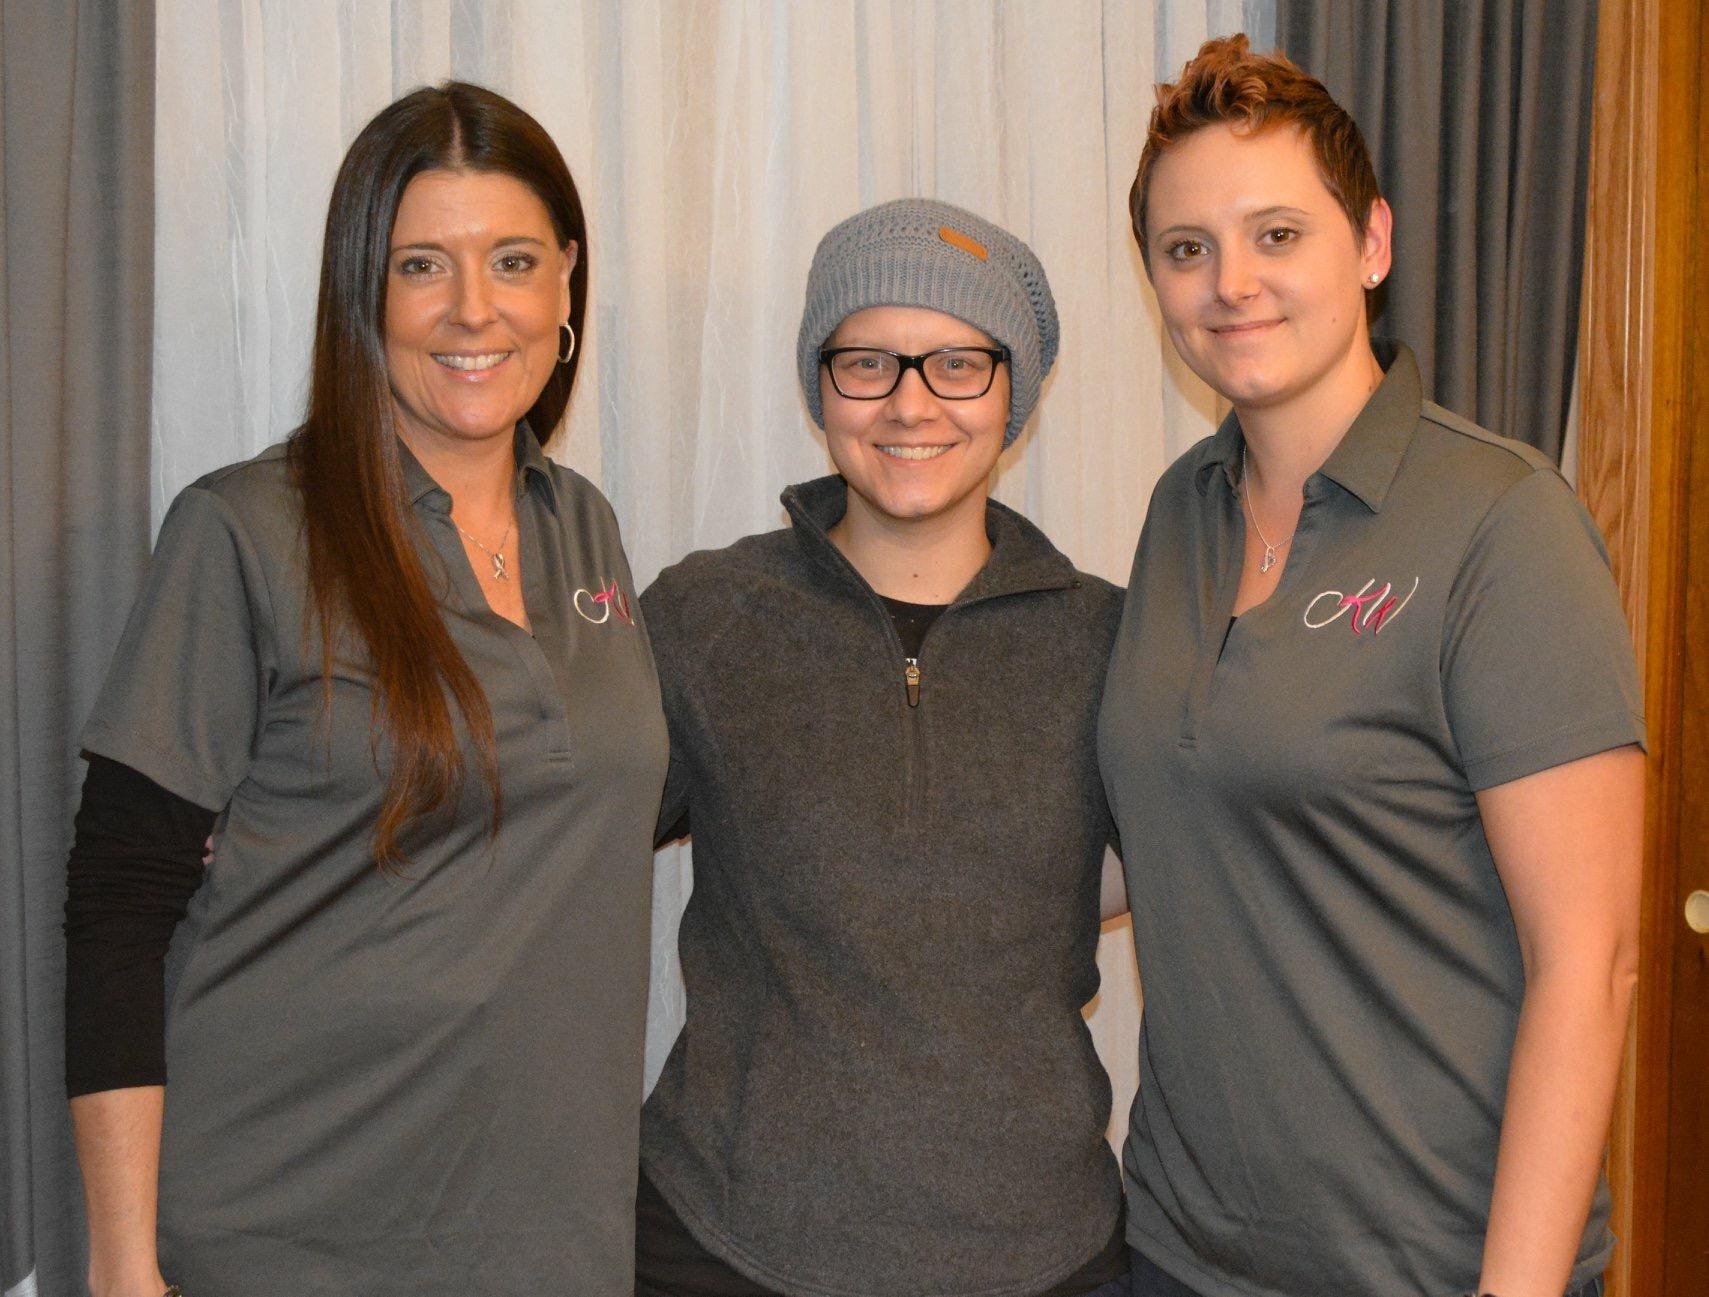 Sherri McKinney, Andrea and Kristina Russell - 11/13/18